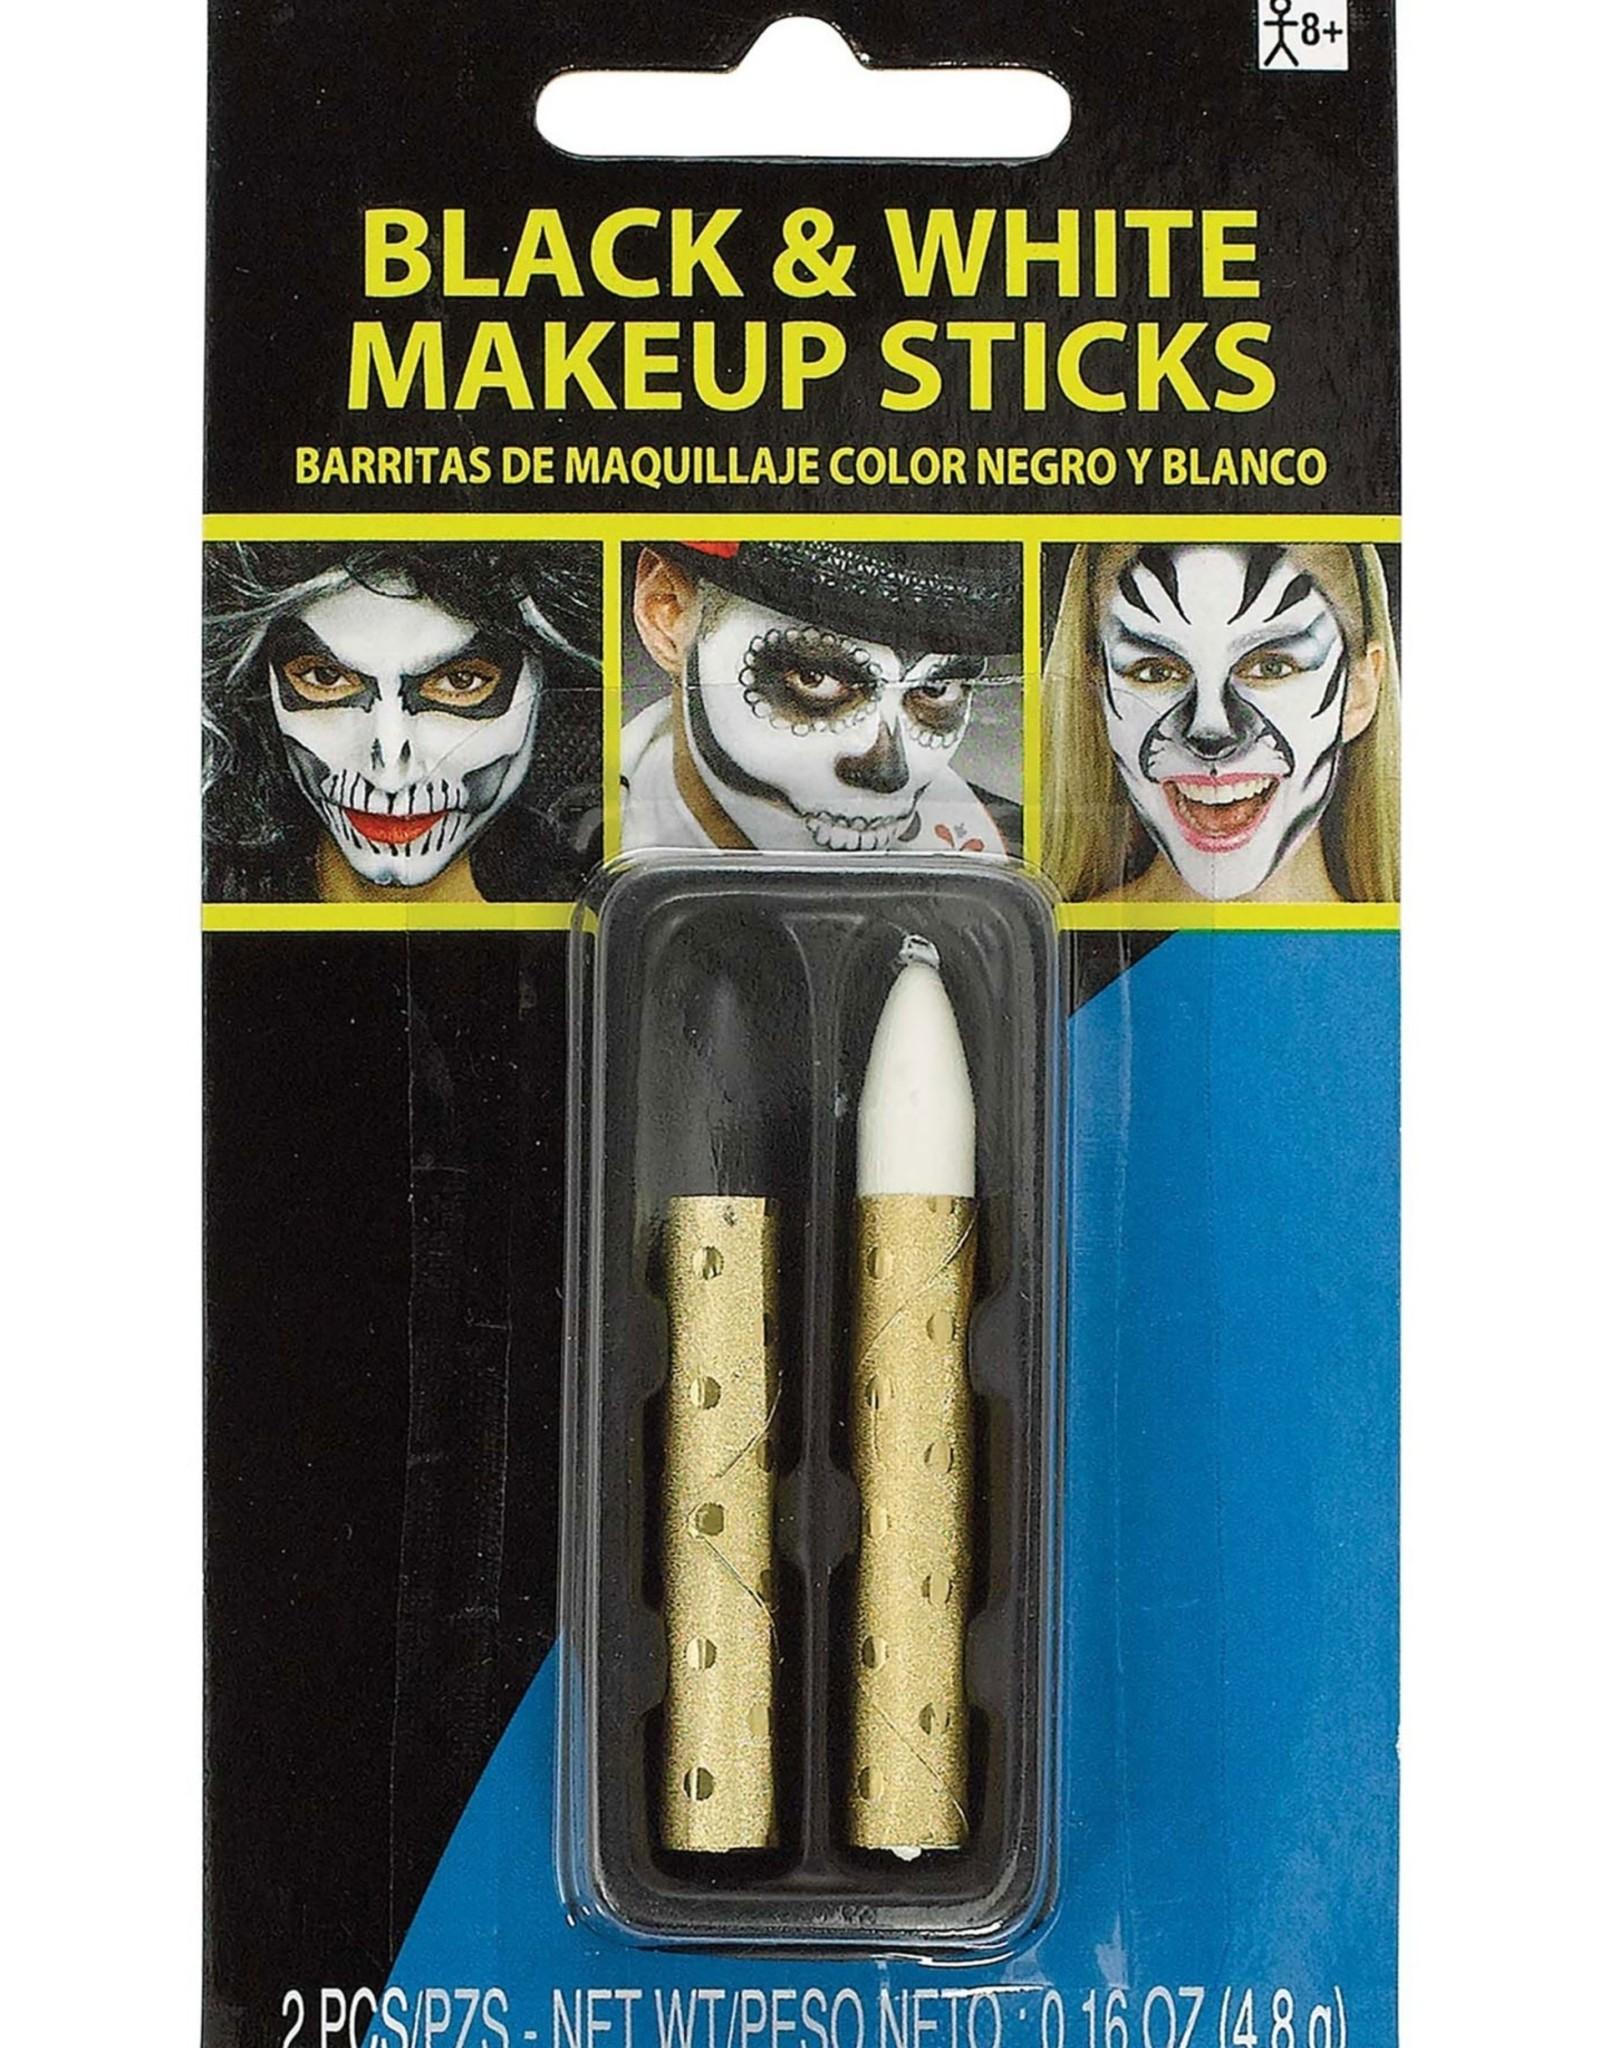 Black and White Makeup Sticks